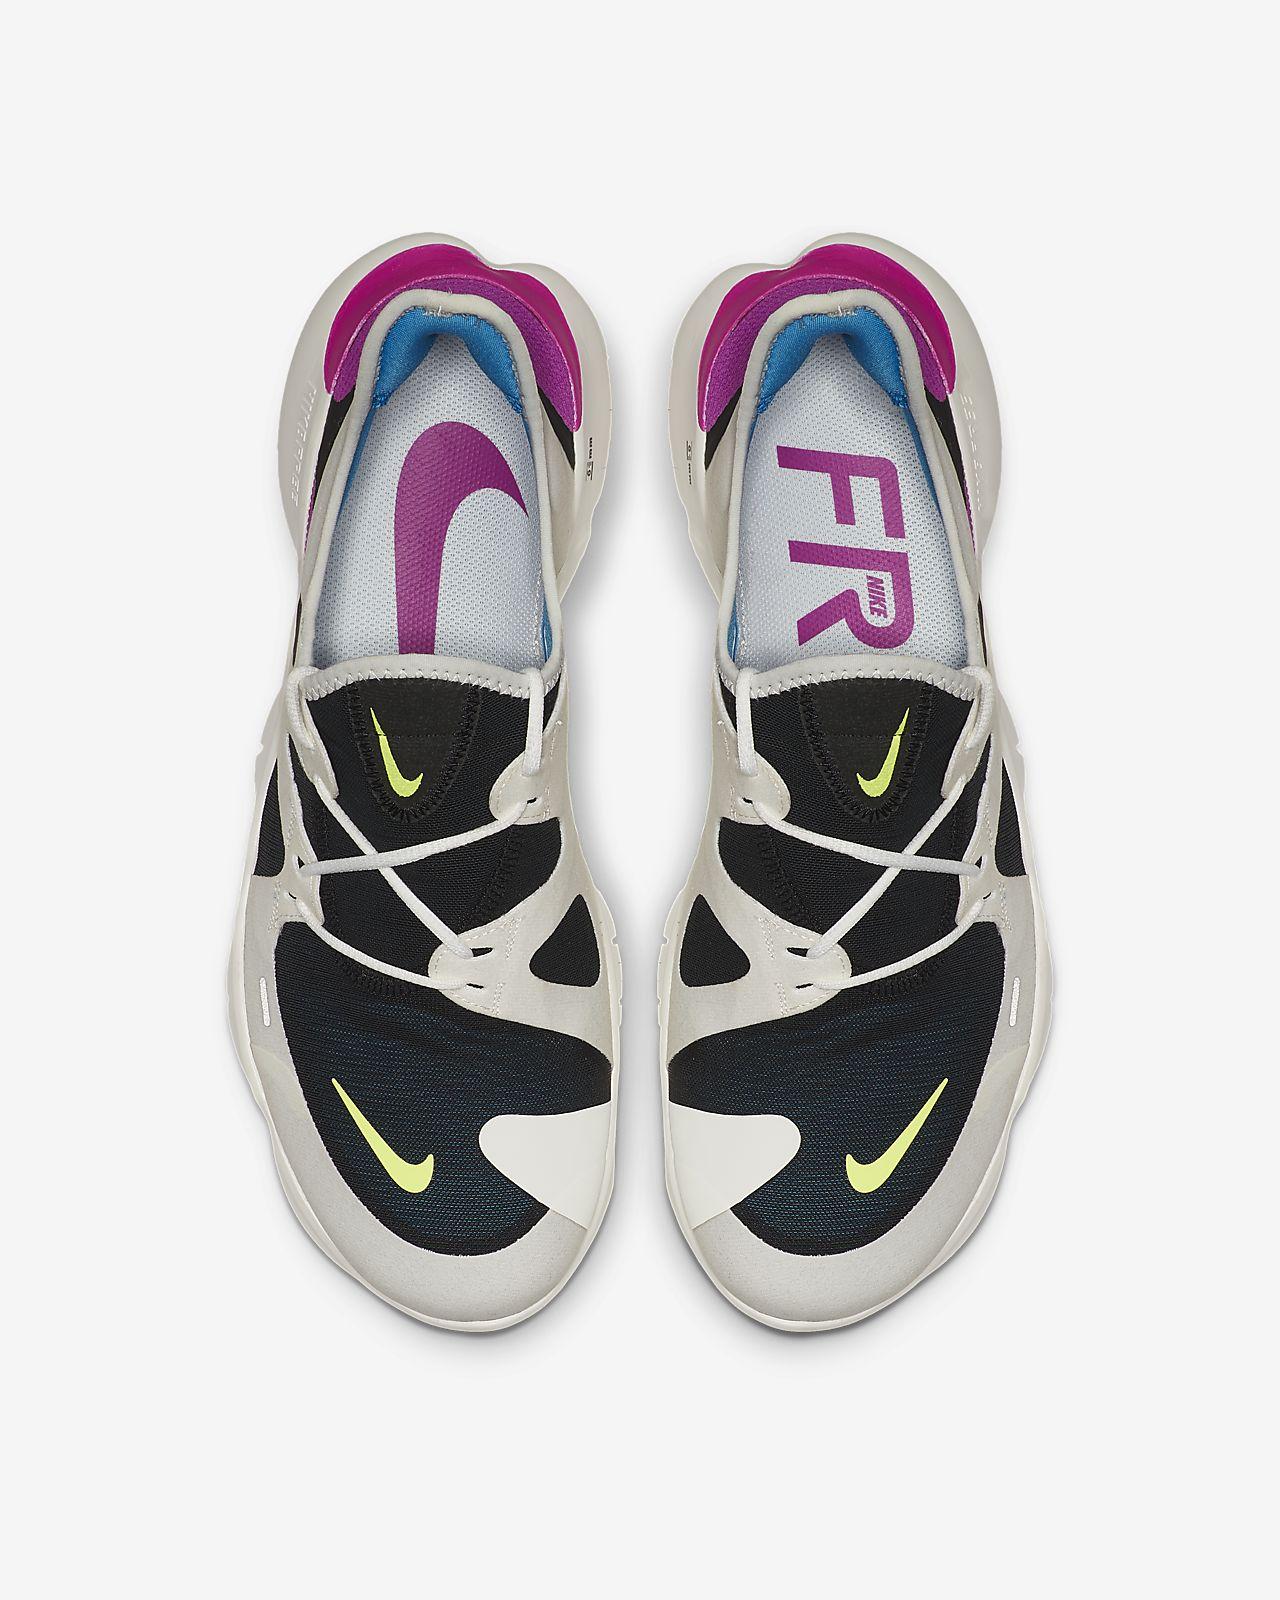 Nike Running Socks Red Mens Air Max Blue Grey Nike Free Run